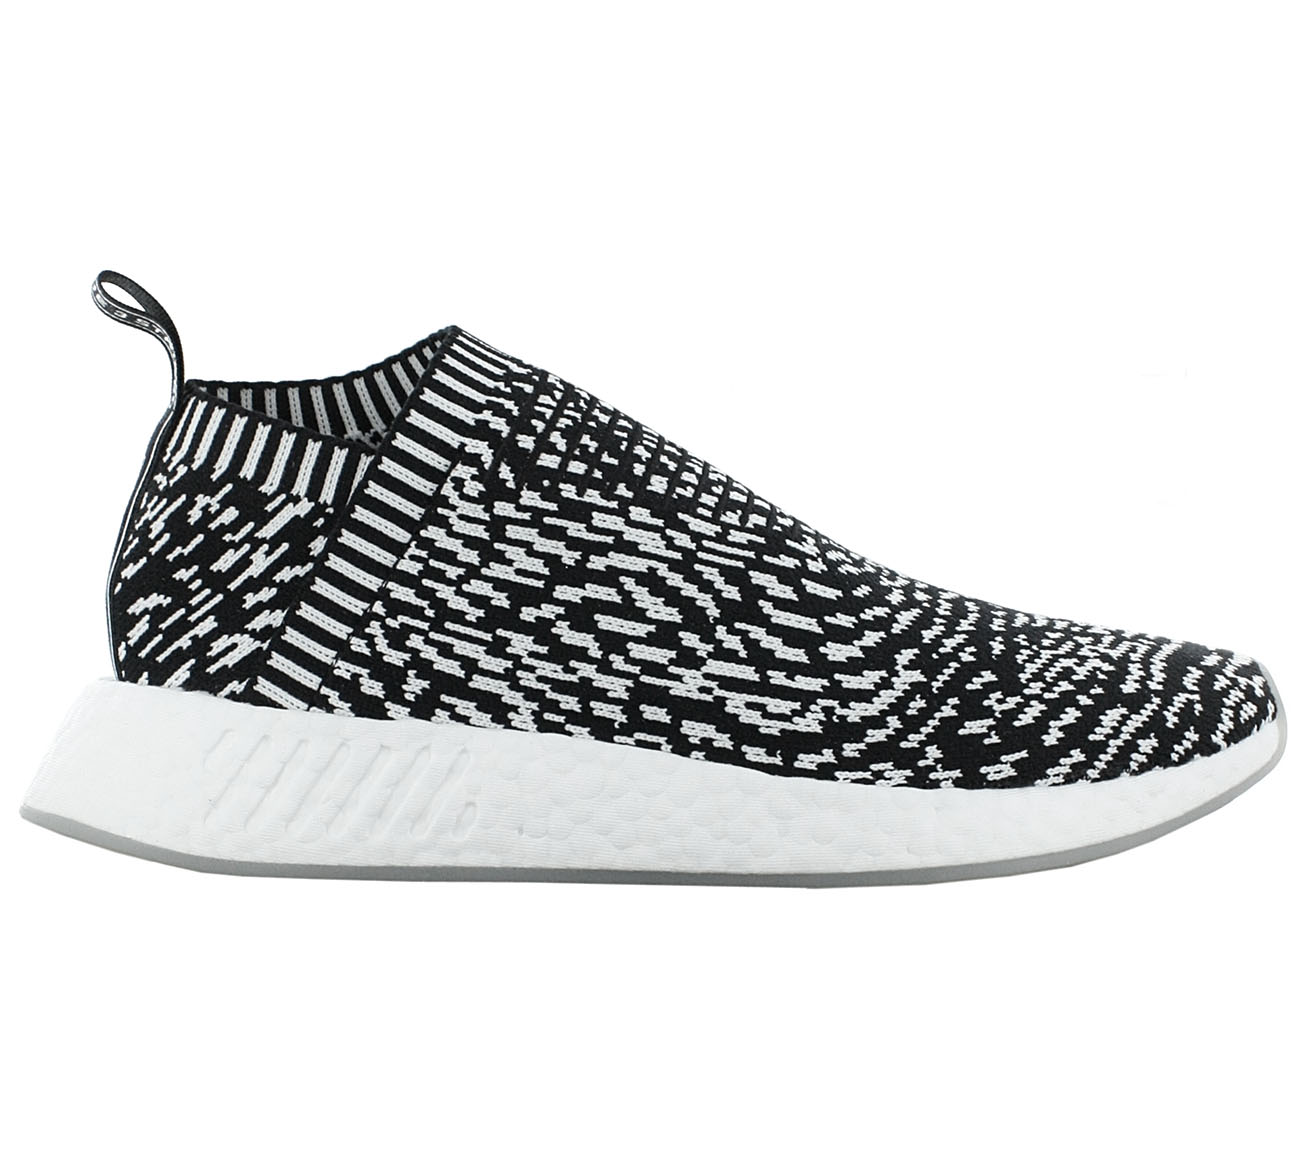 best service 57e0b 53ff7 Adidas NMD CS2 PK Primeknit boost scarpe sneakers uomo Bianco Nero NUOVO  by3012 - tualu.org